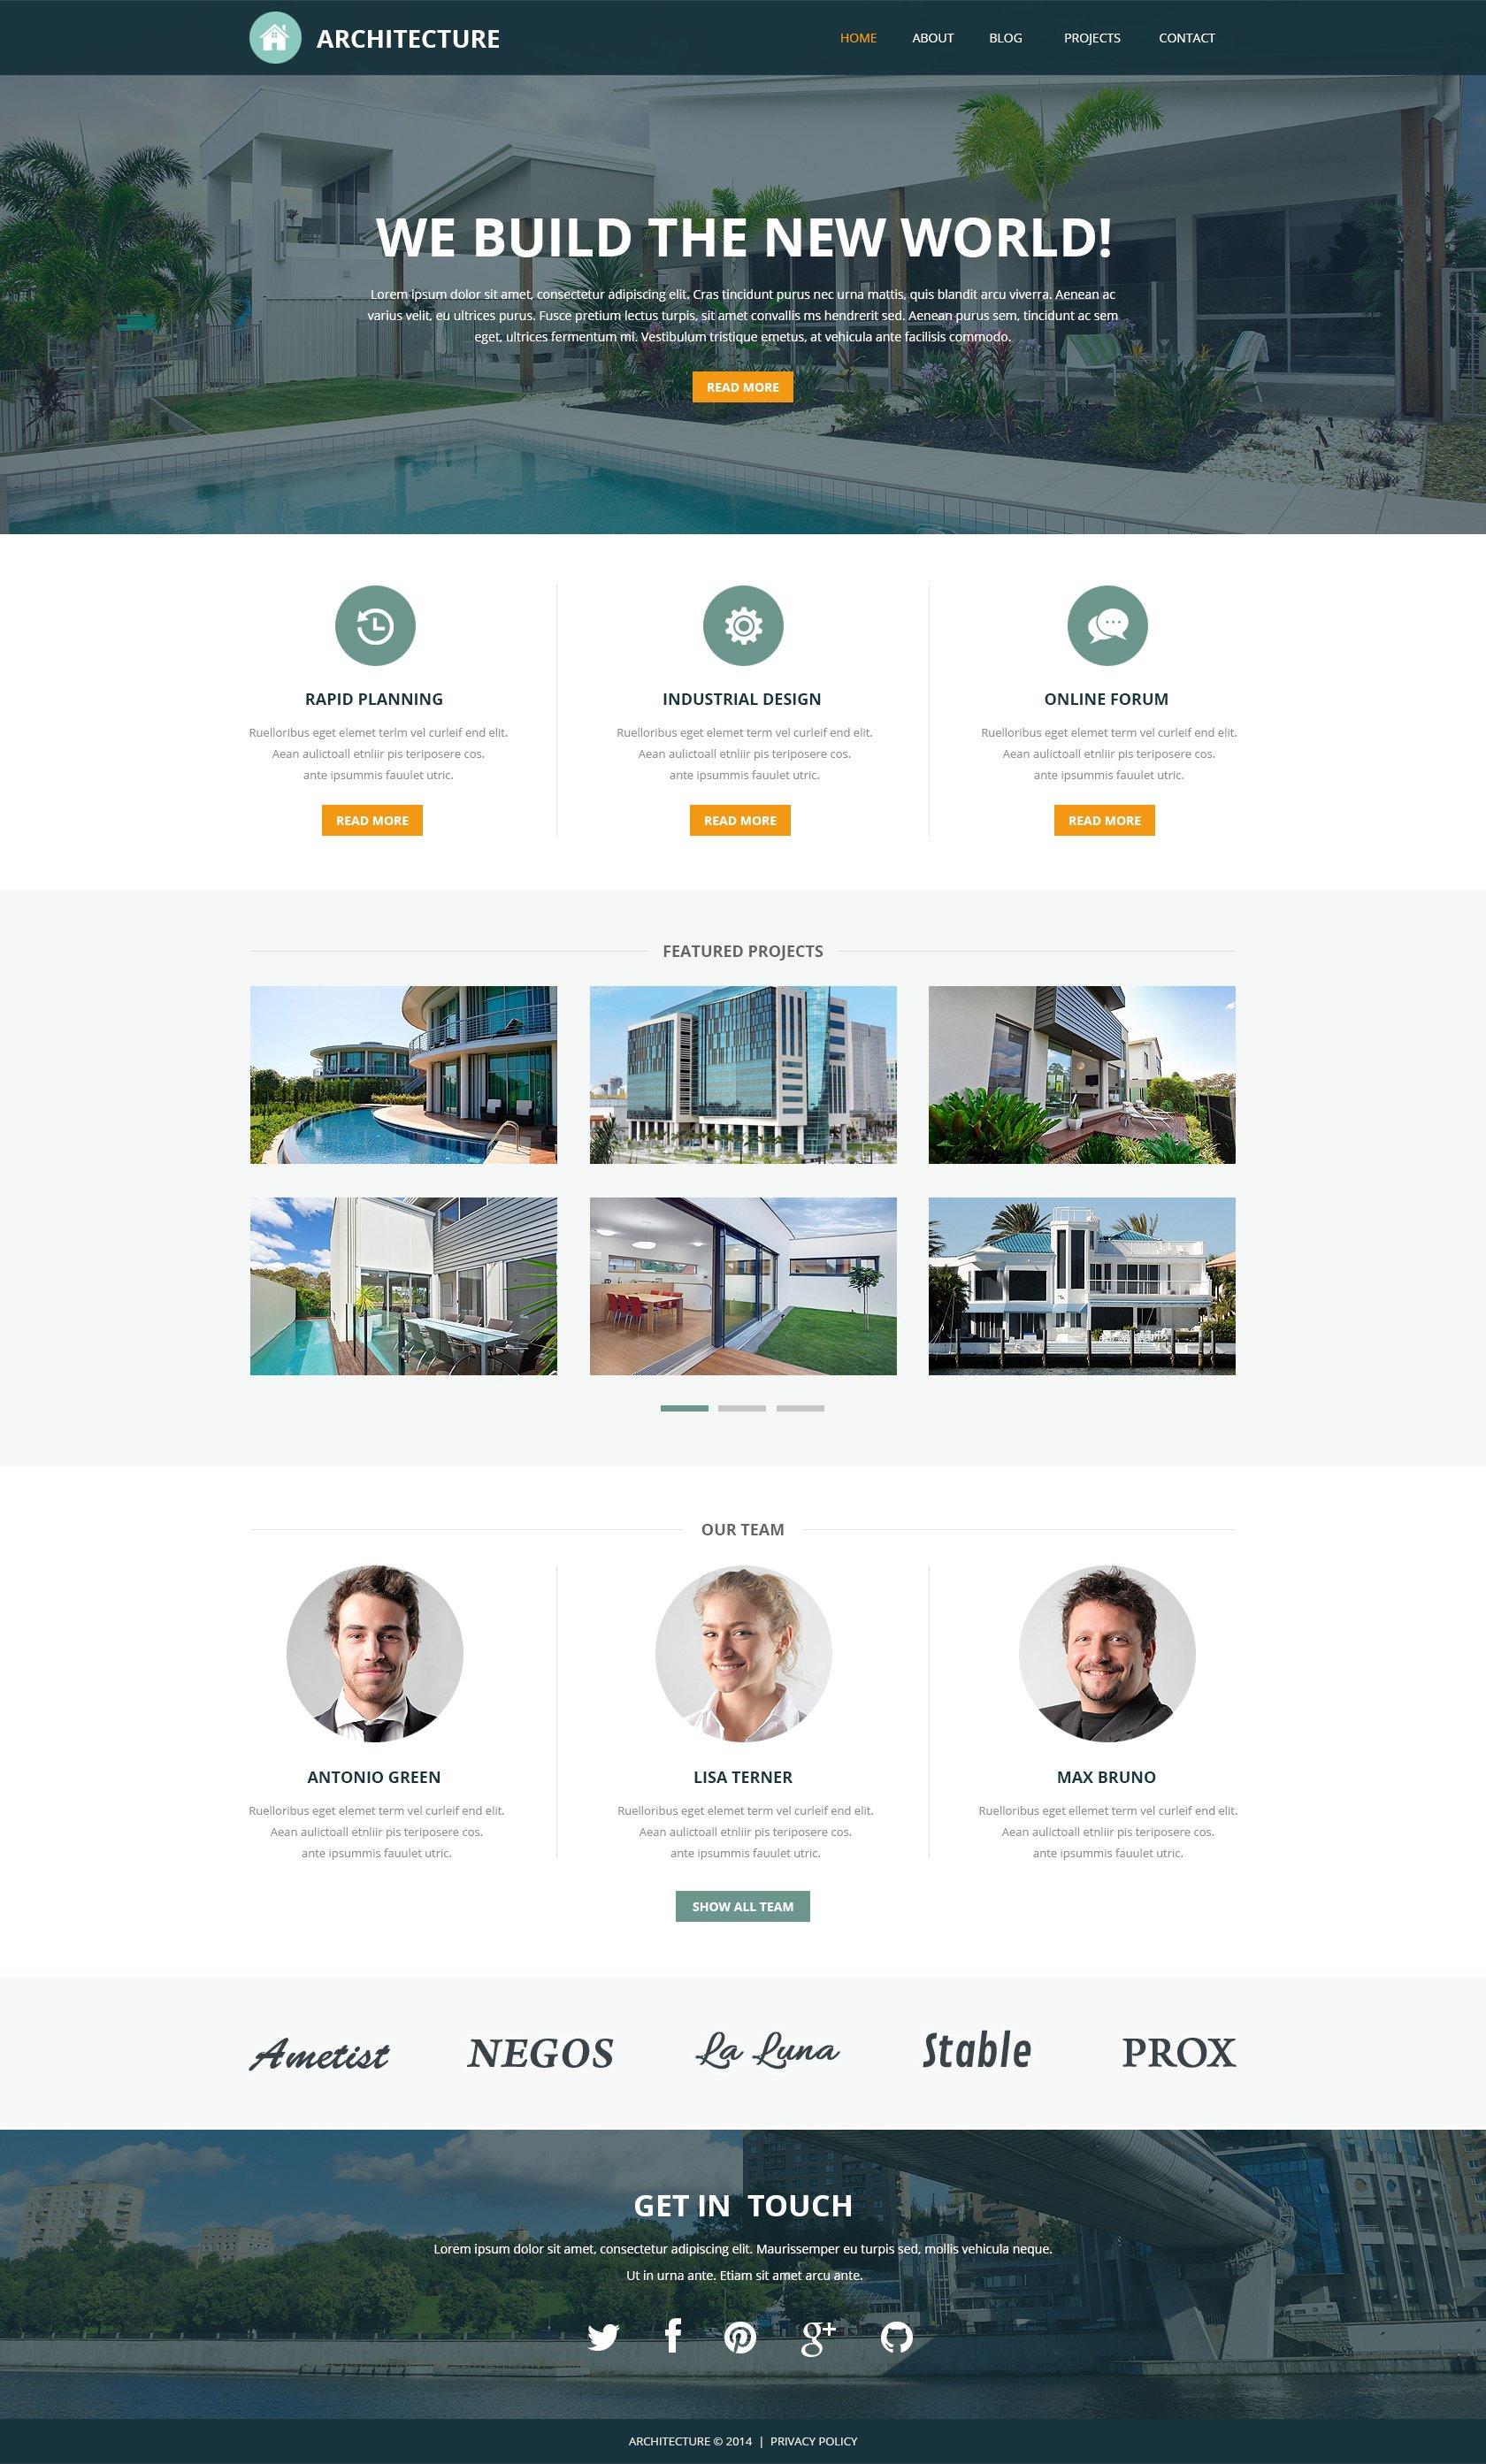 Responsywny szablon Joomla Pro Architectural Designs #51247 - zrzut ekranu